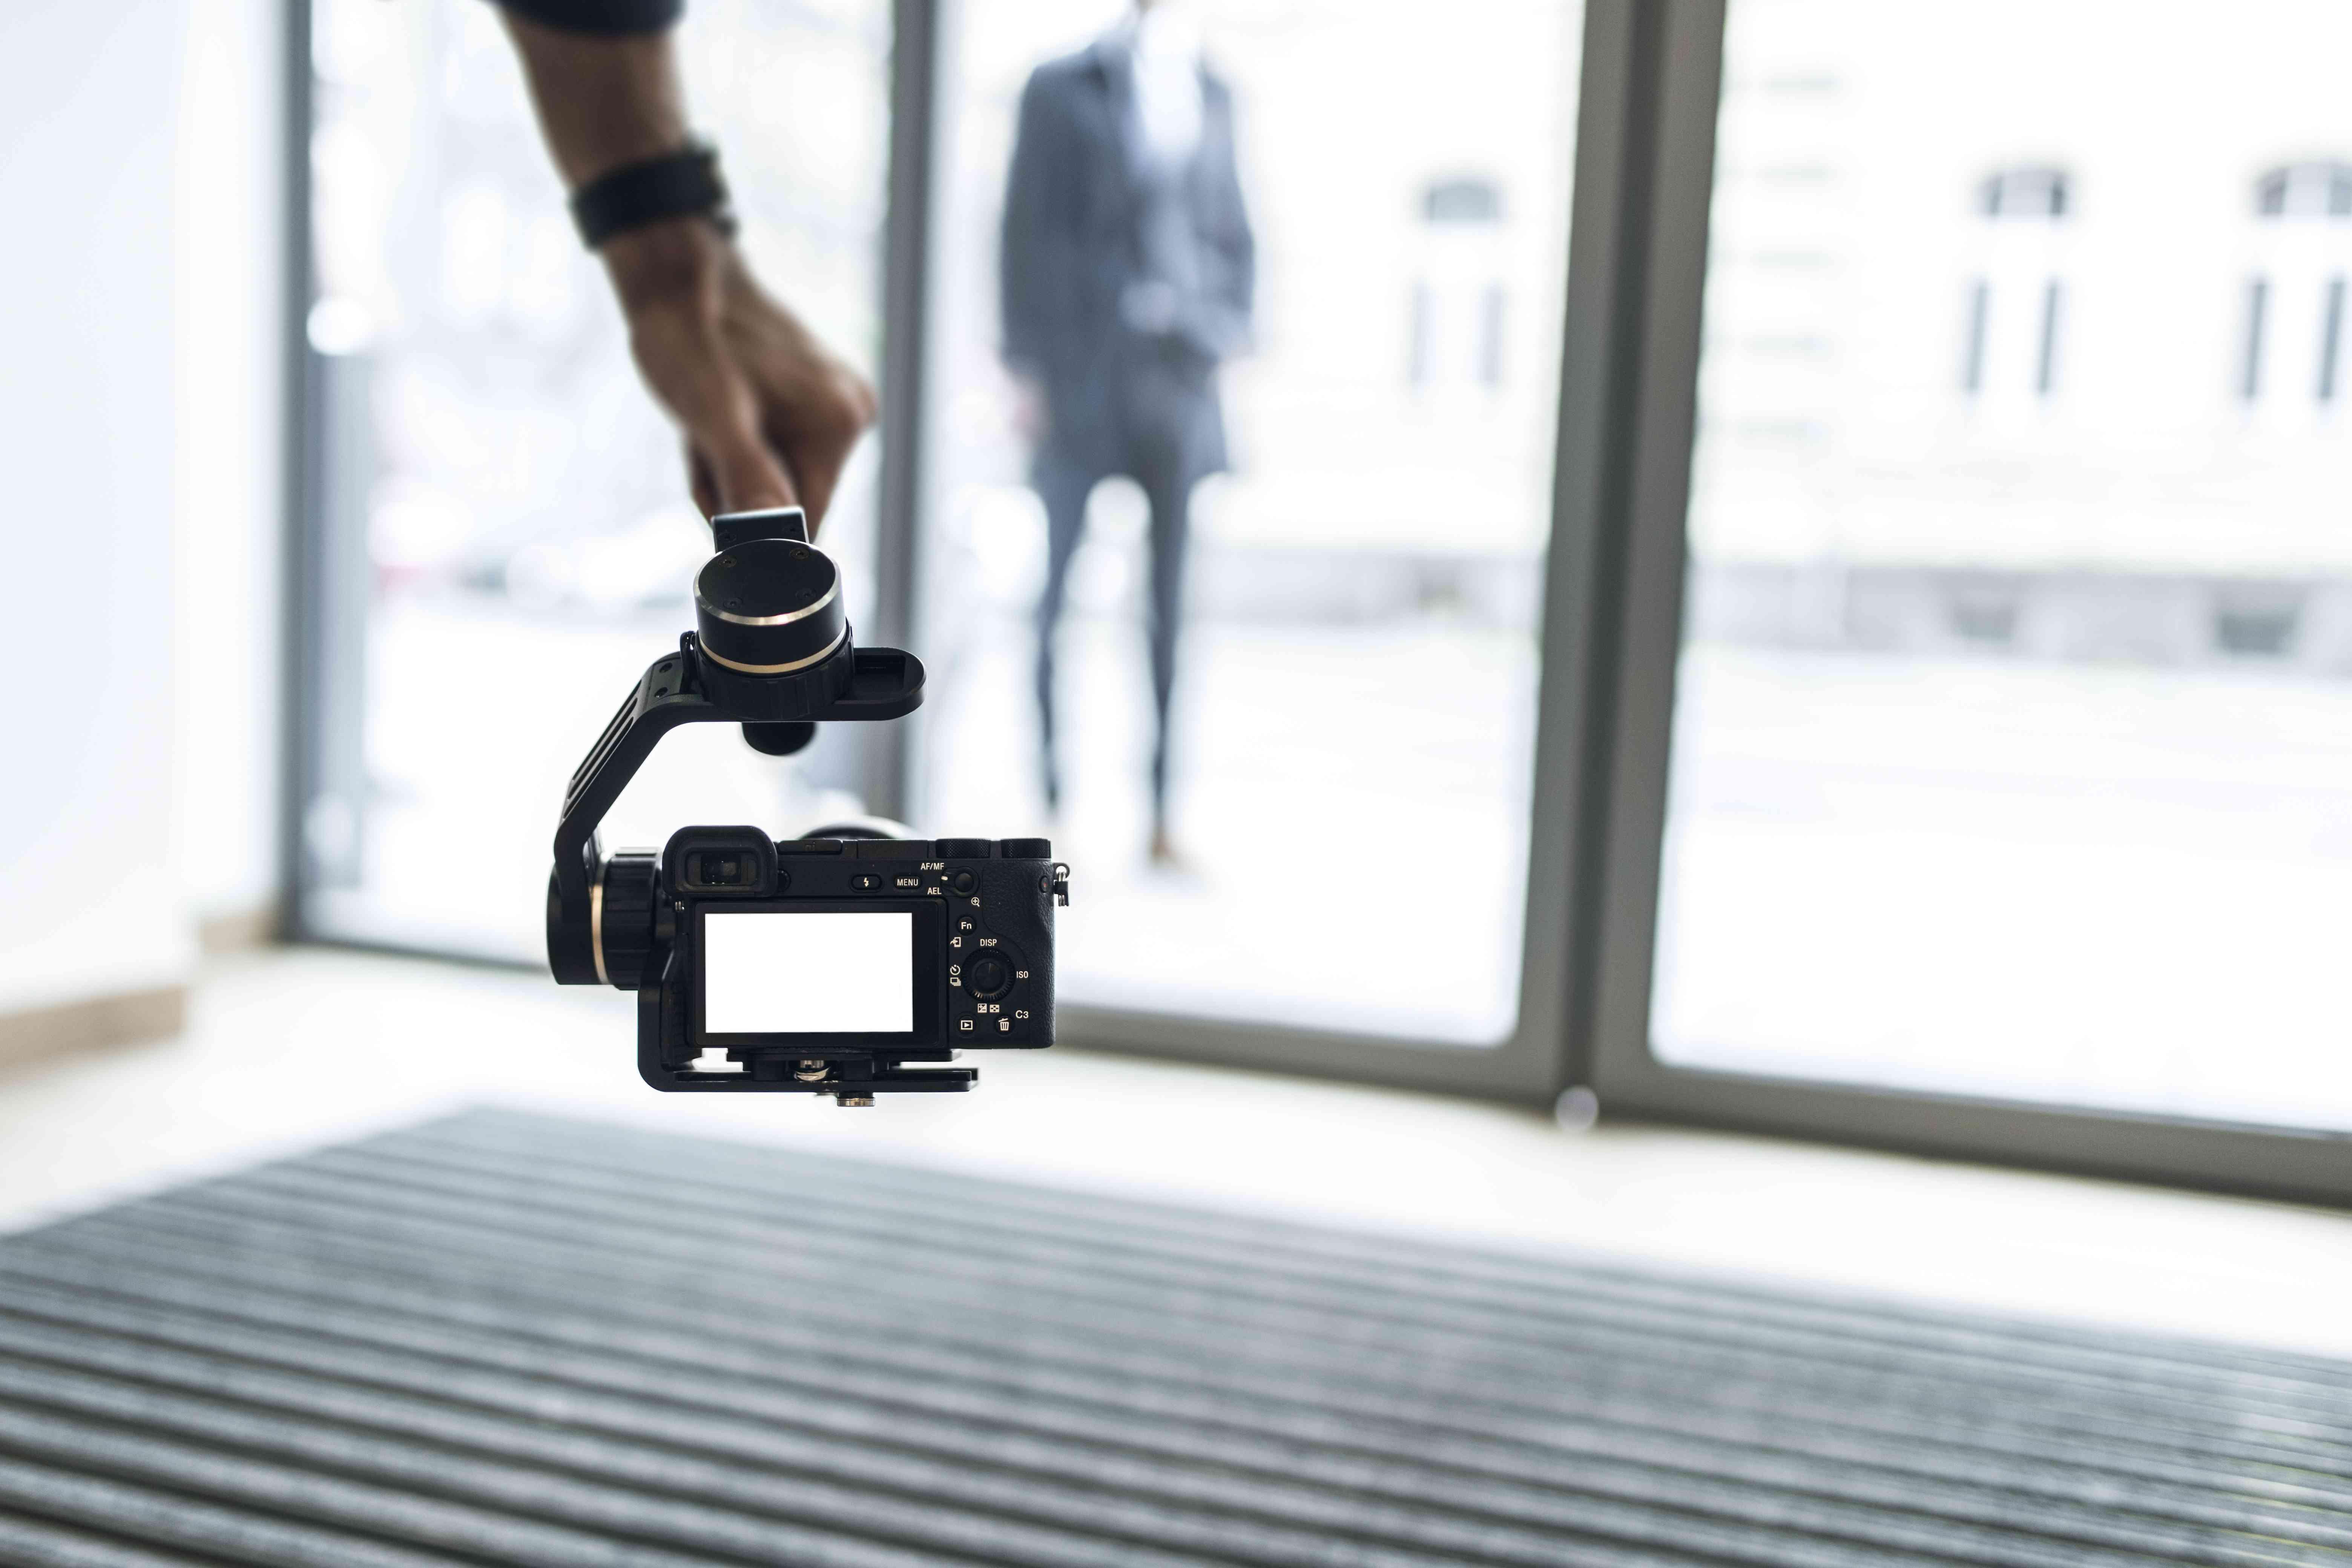 A videographer shooting using steadicam